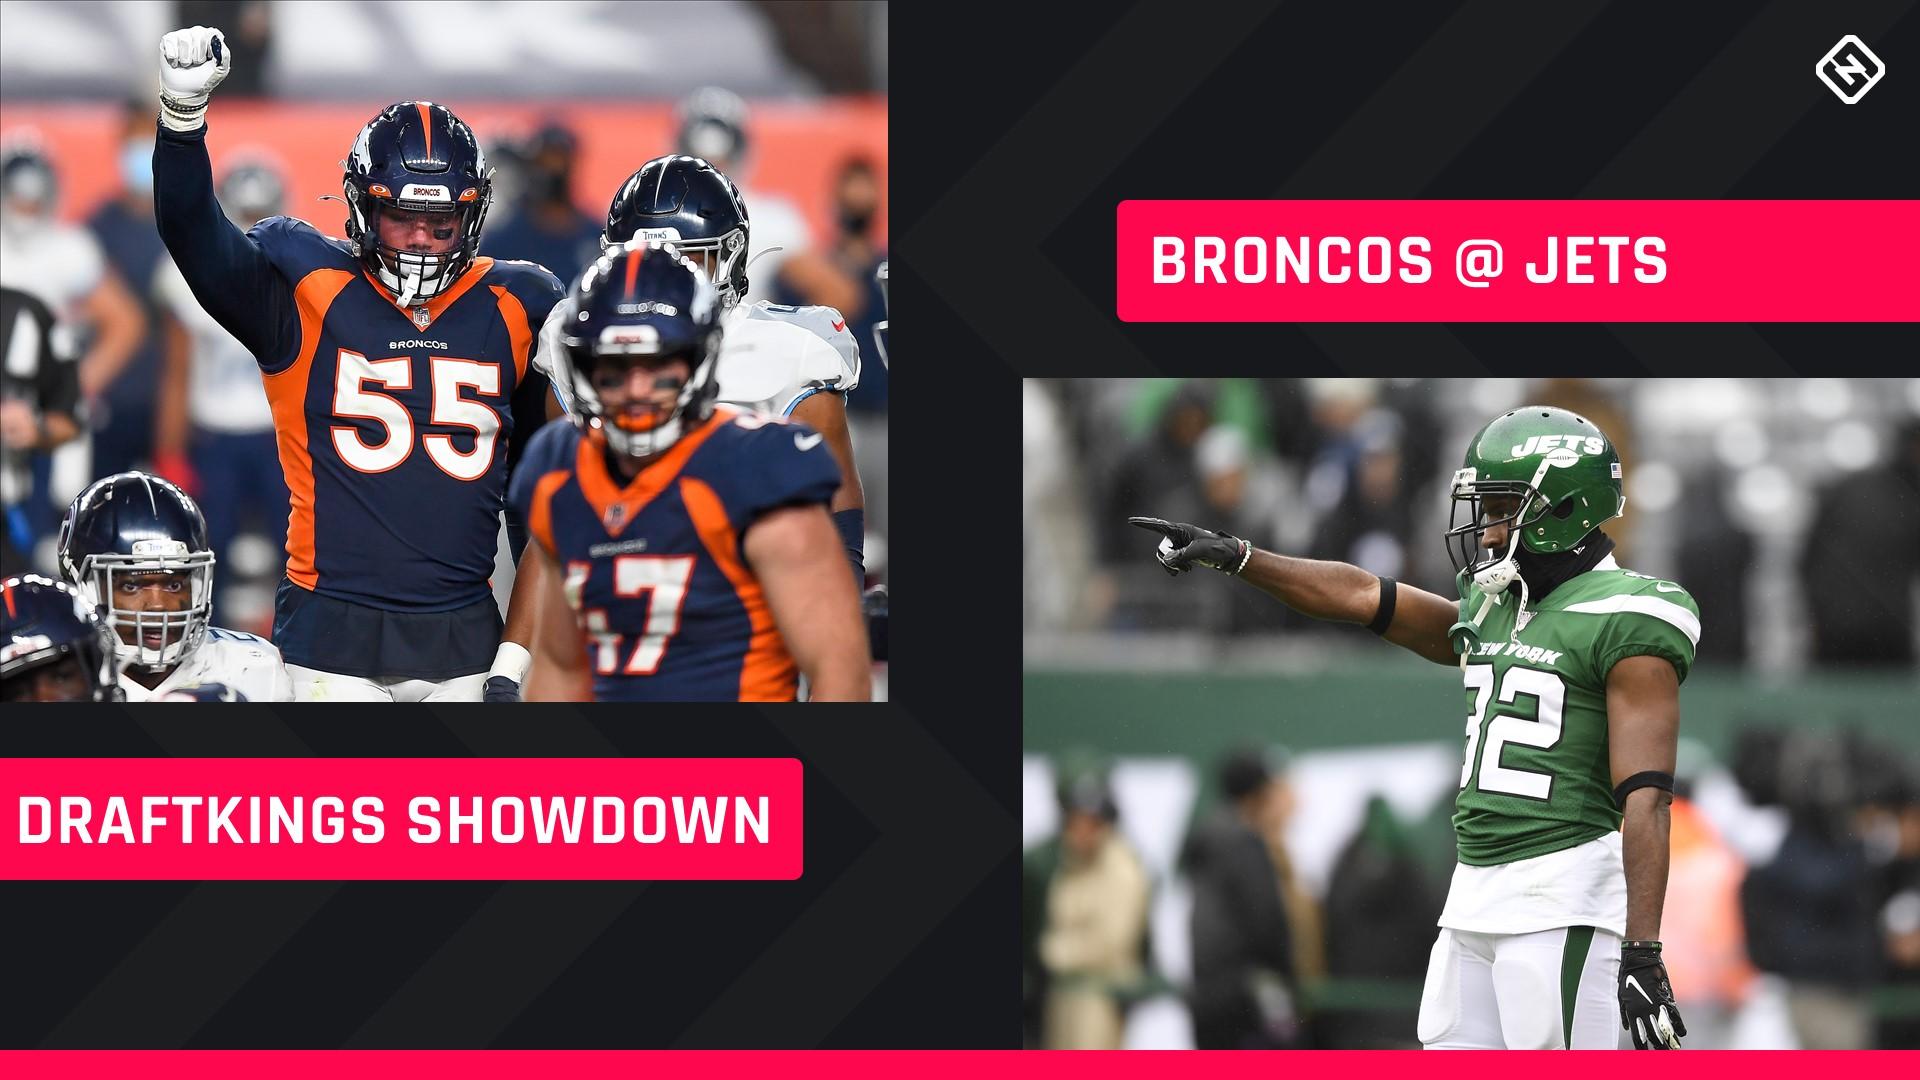 Thursday Night Football Draftkings Picks Nfl Dfs Lineup Advice For Week 4 Jets Broncos Showdown Tournaments Sporting News